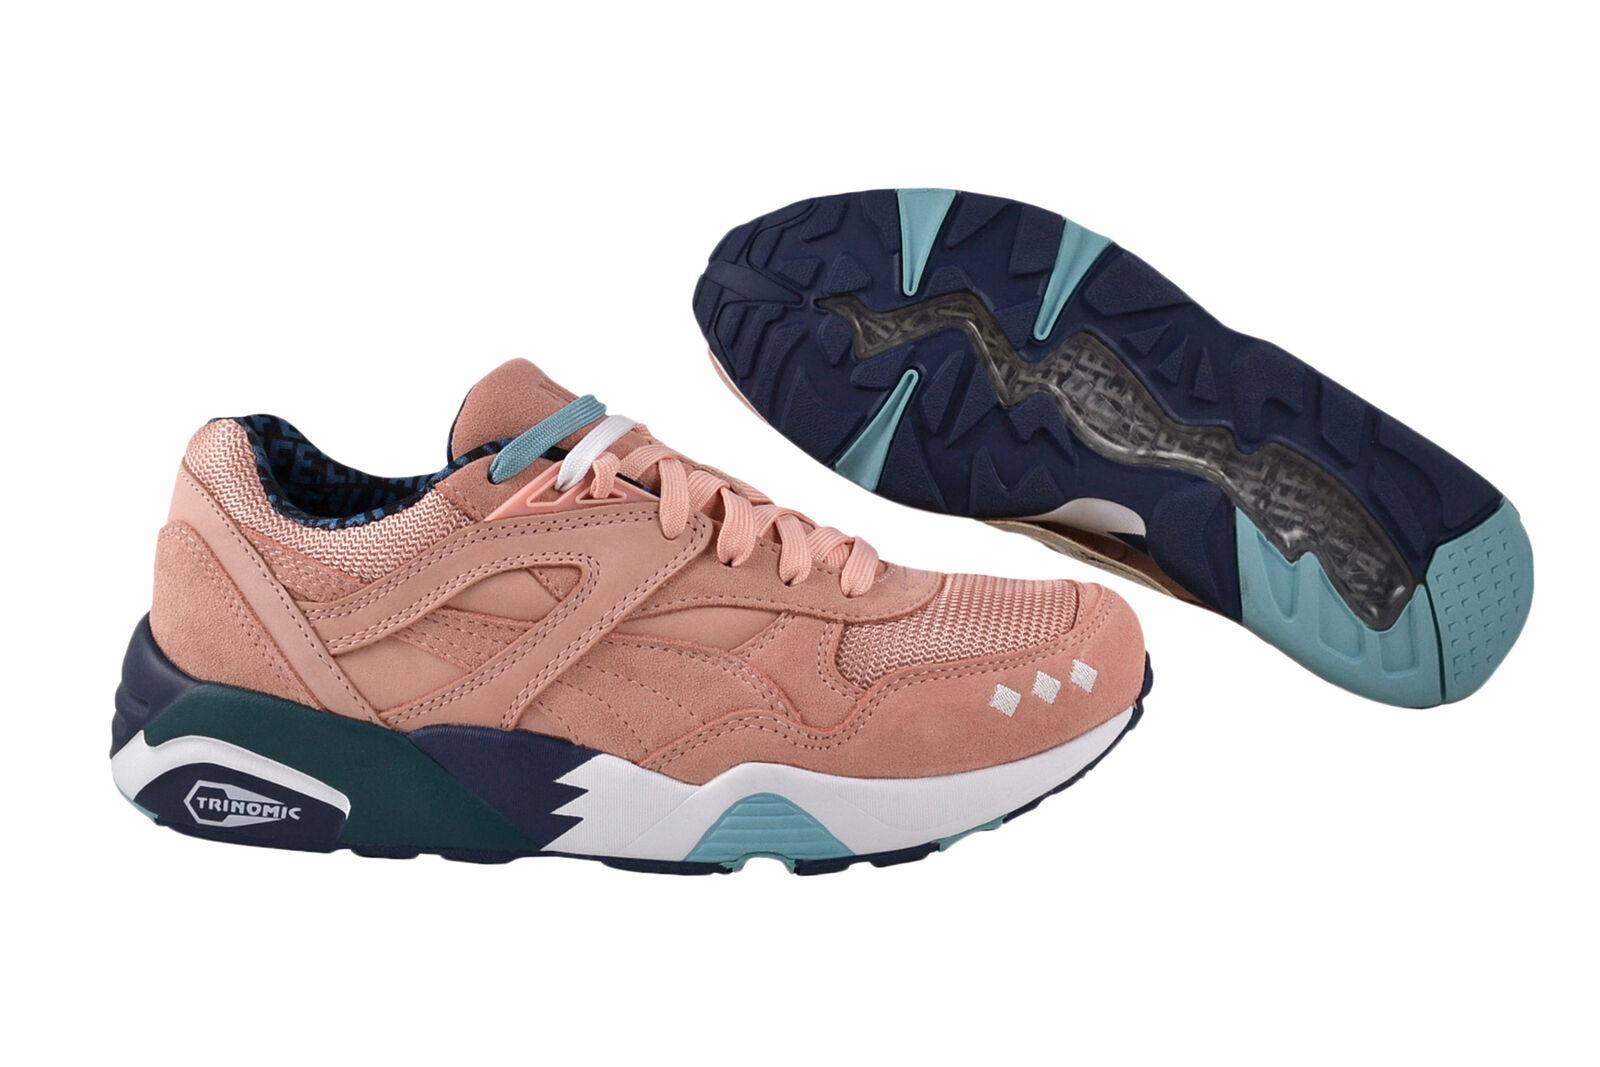 Puma R698 X-Alife peach bud/lyons rosa Azul Sneaker/Zapatos rosa bud/lyons bf4c5d